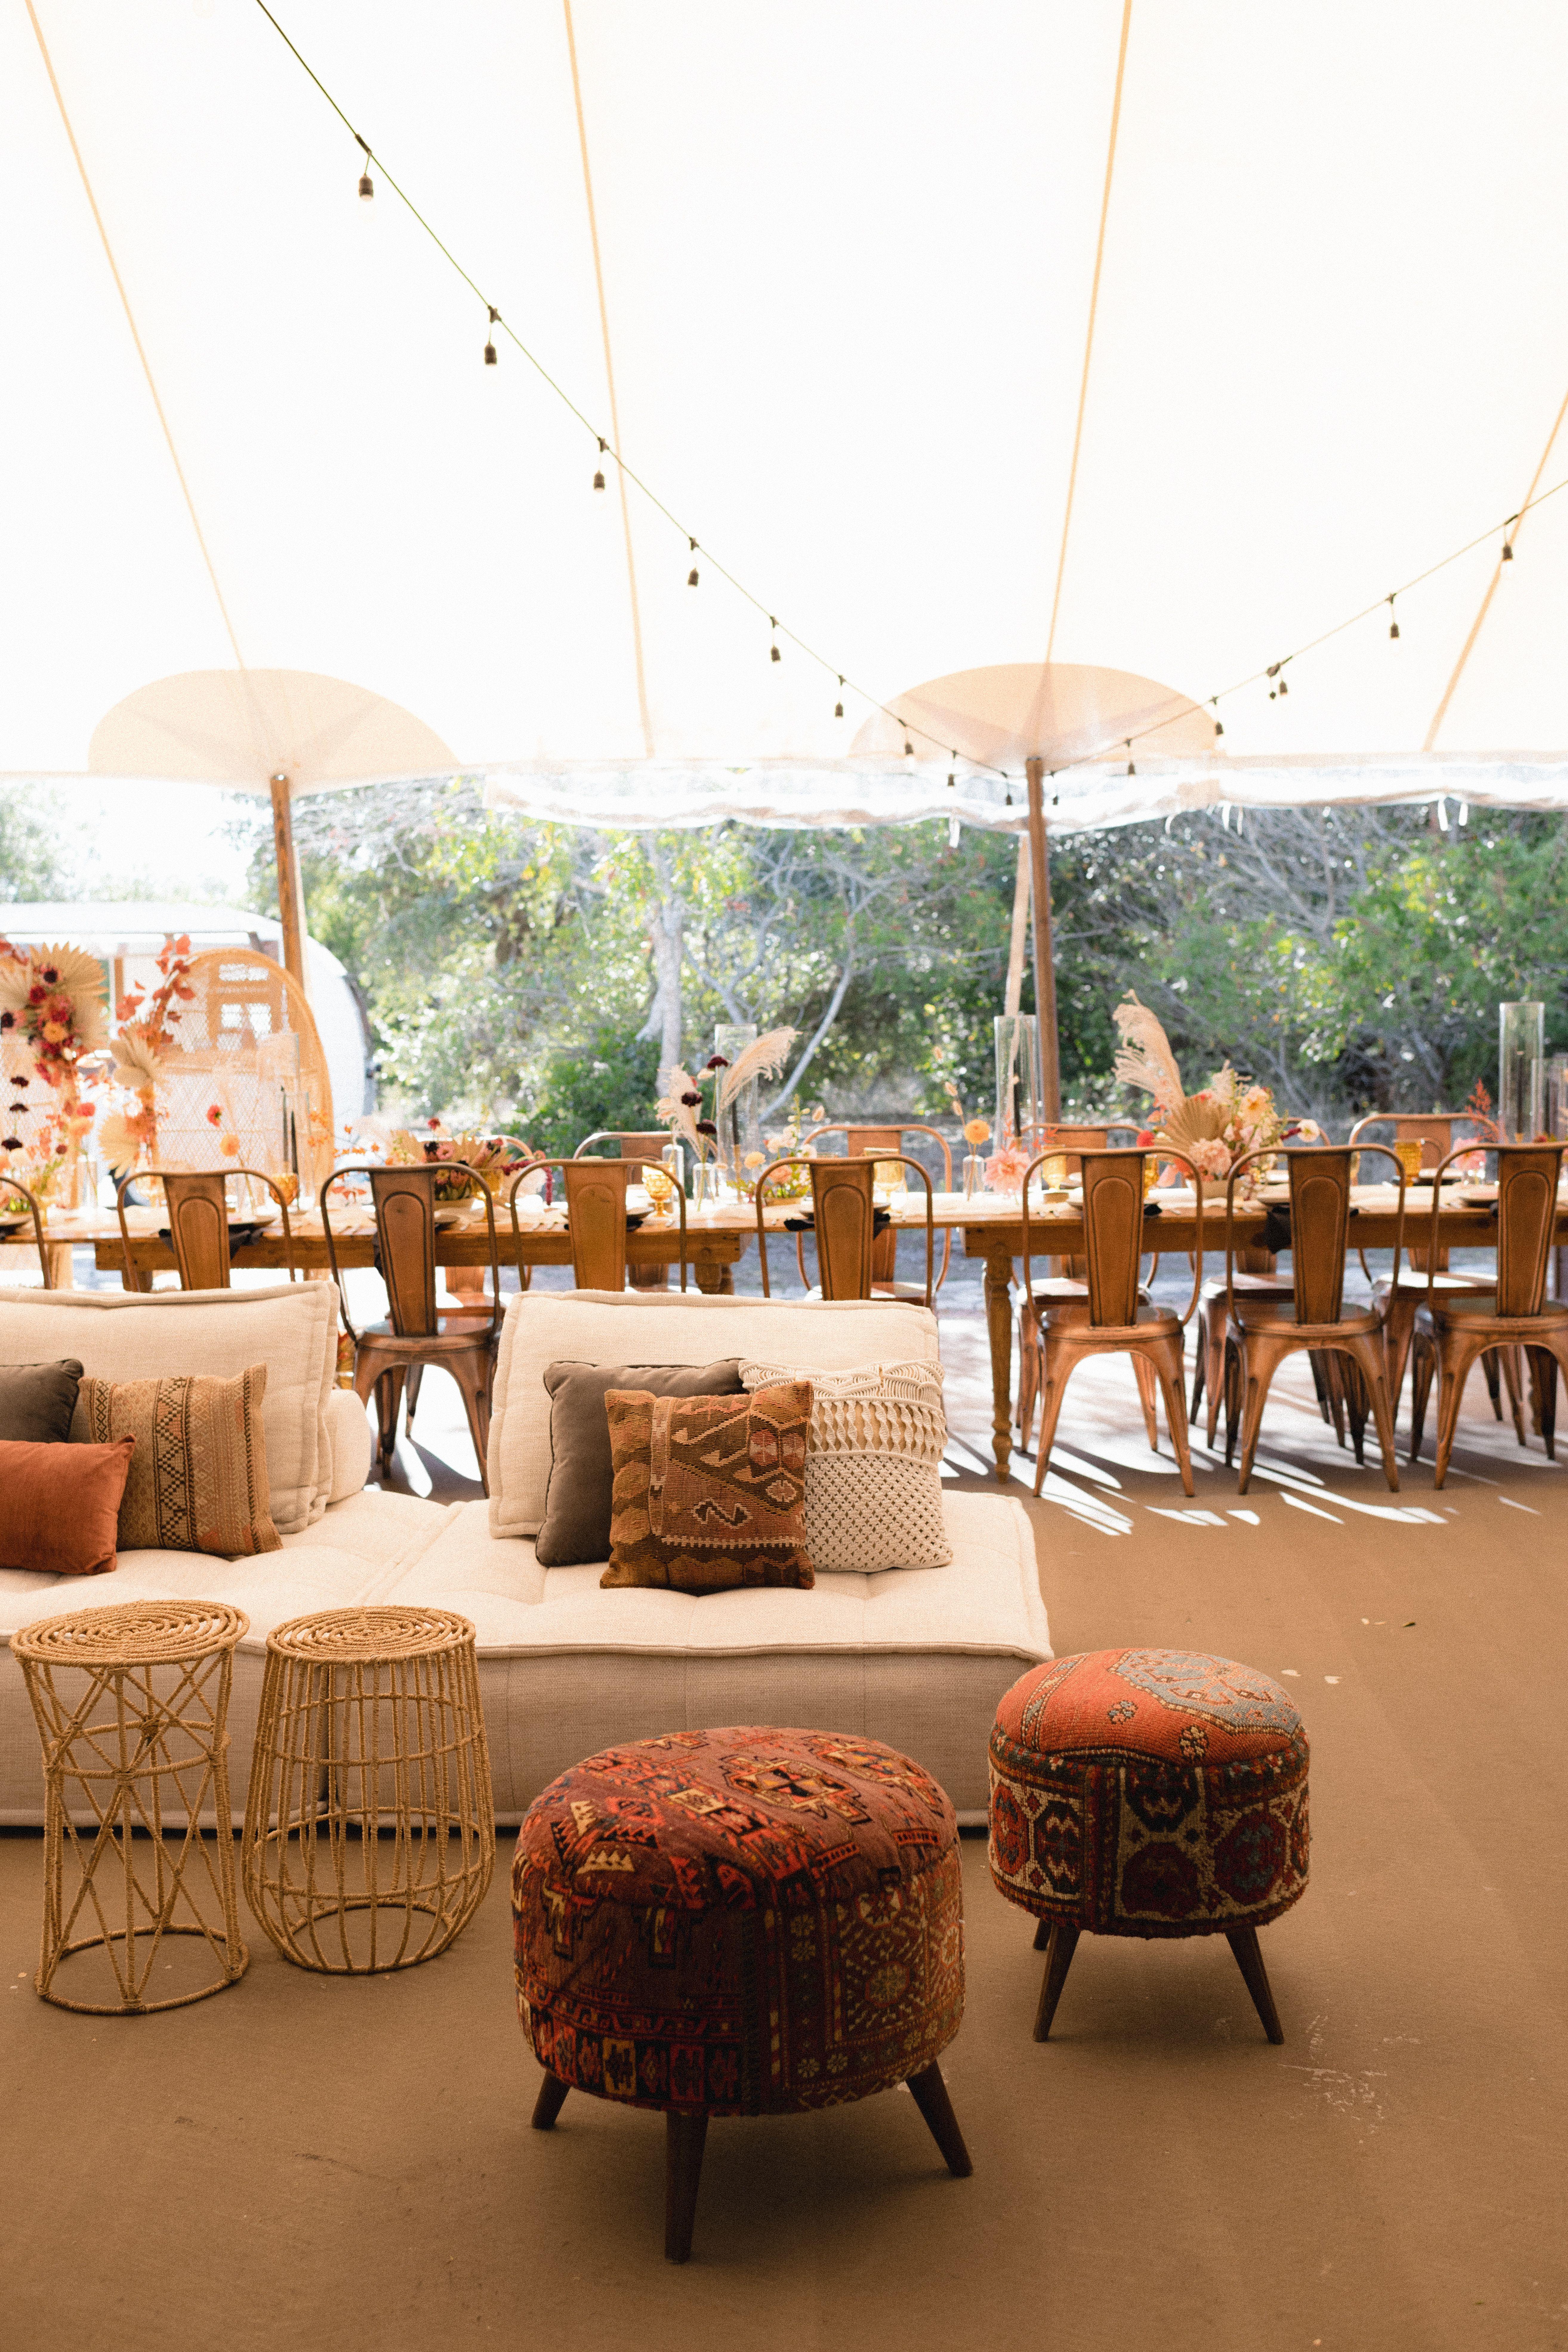 Boho spring wedding furniture rentals by loot in austin